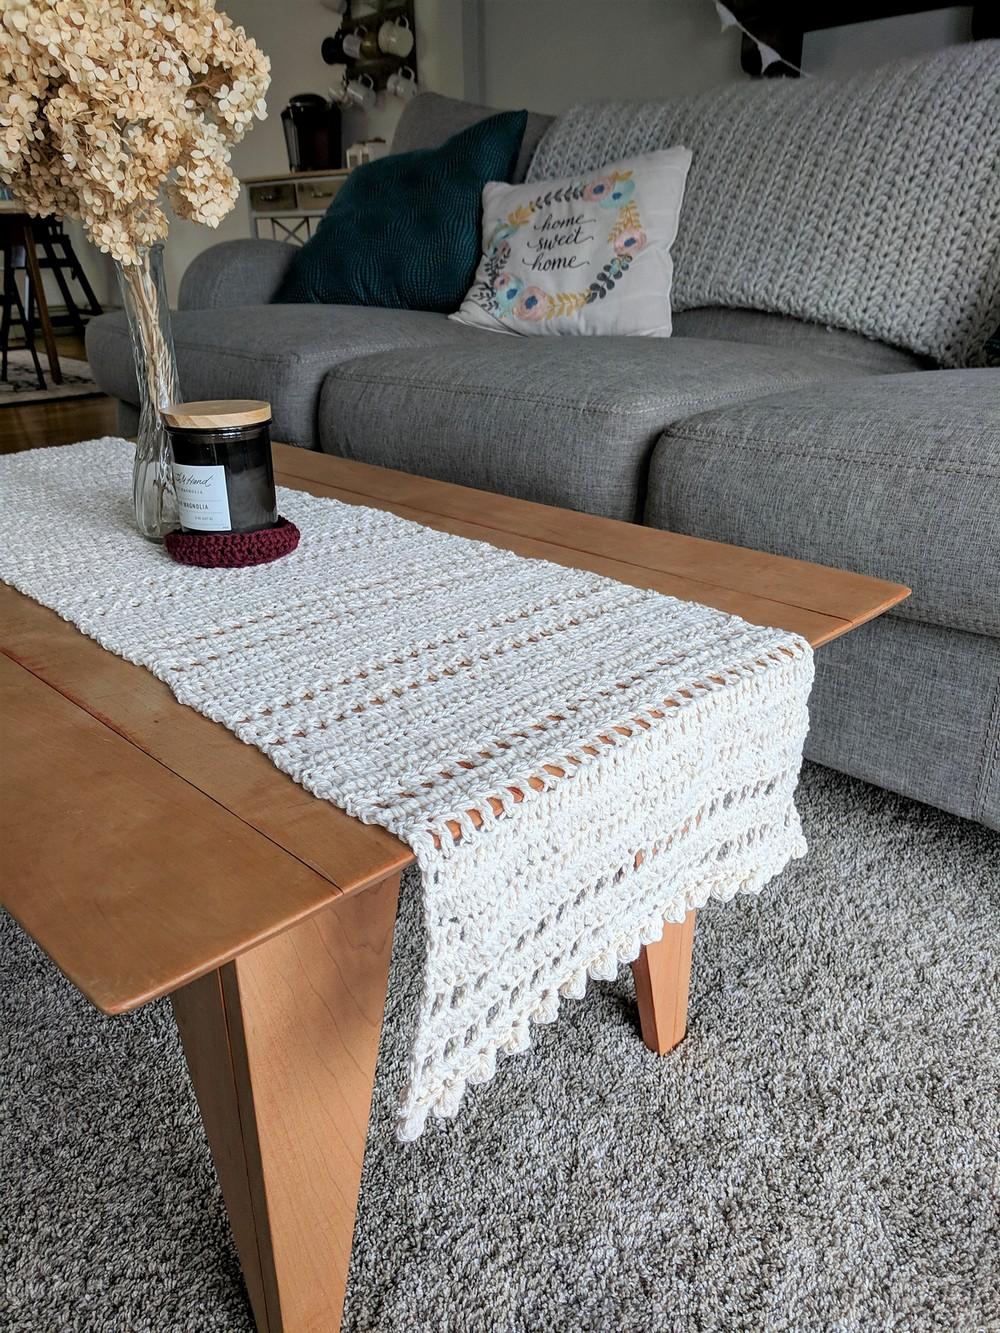 Home Sweet Home Table Runner